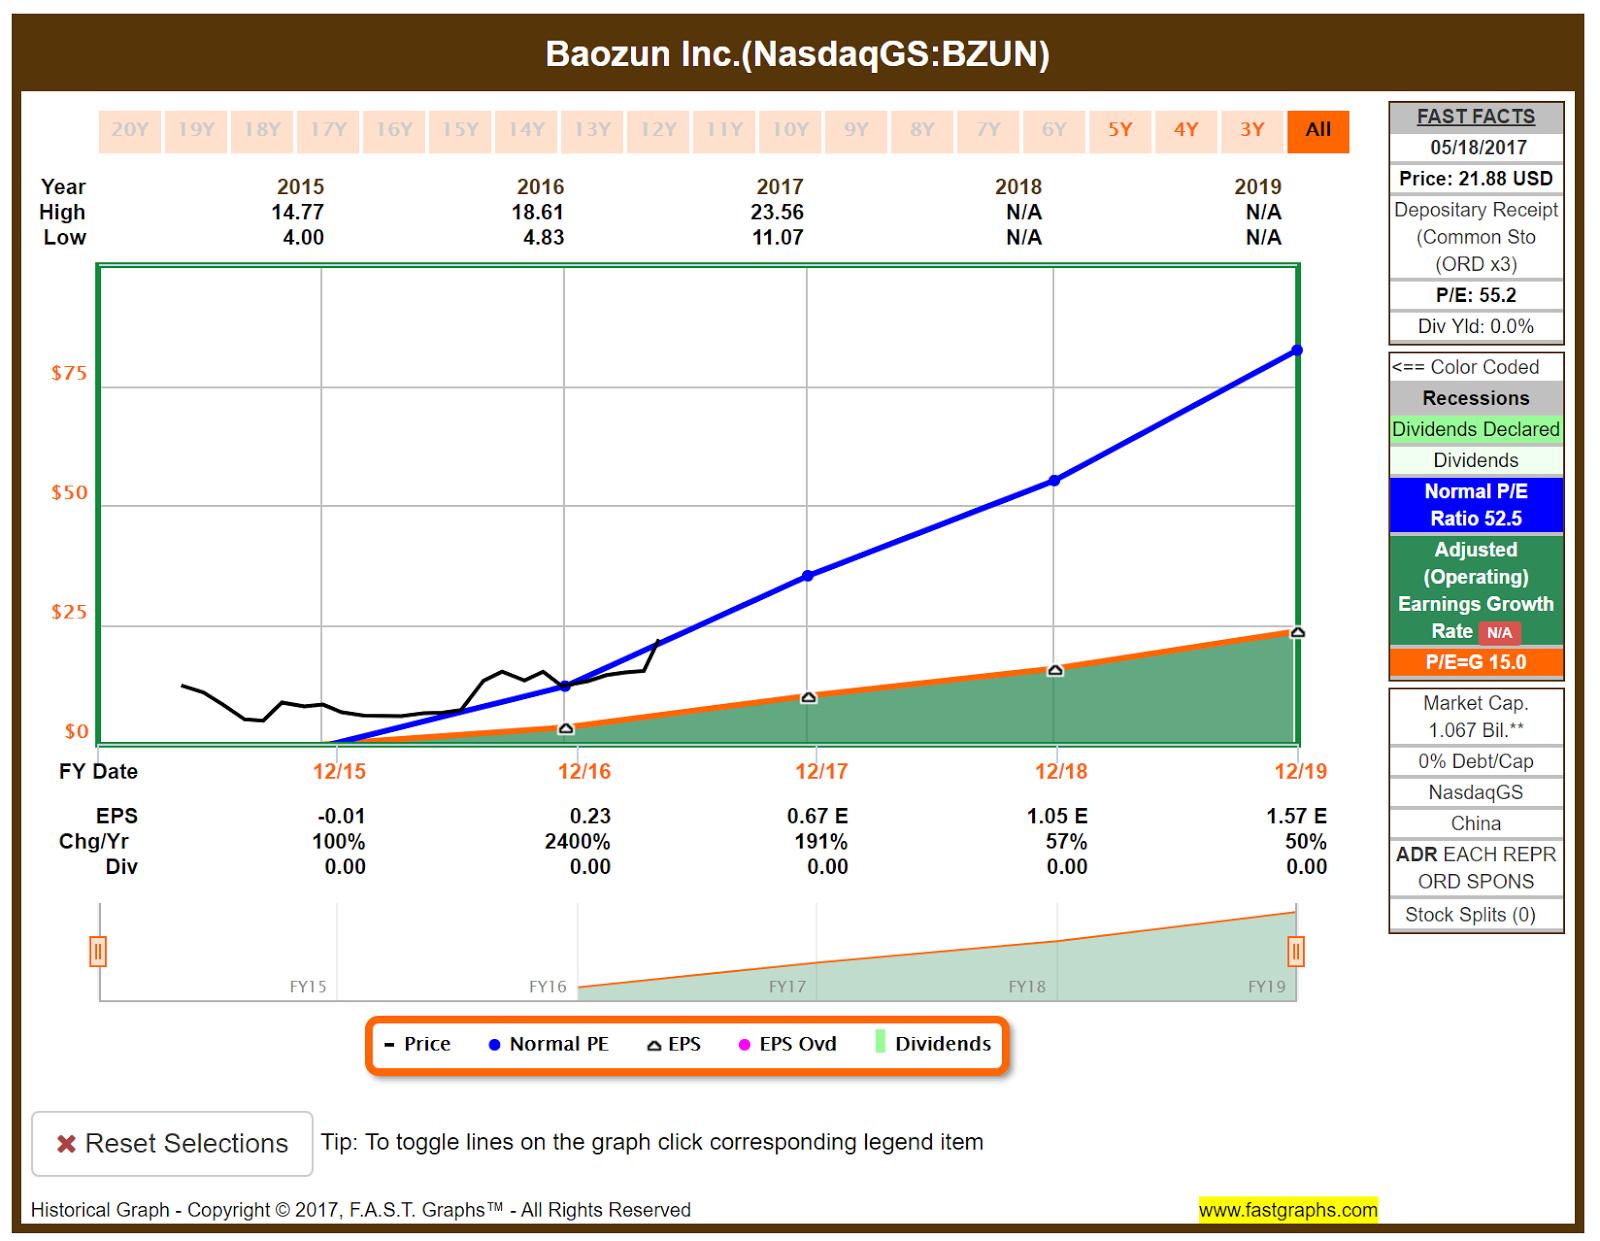 Buy The Chinese Shopify That Rose 200 This Year Baozun Nasdaq